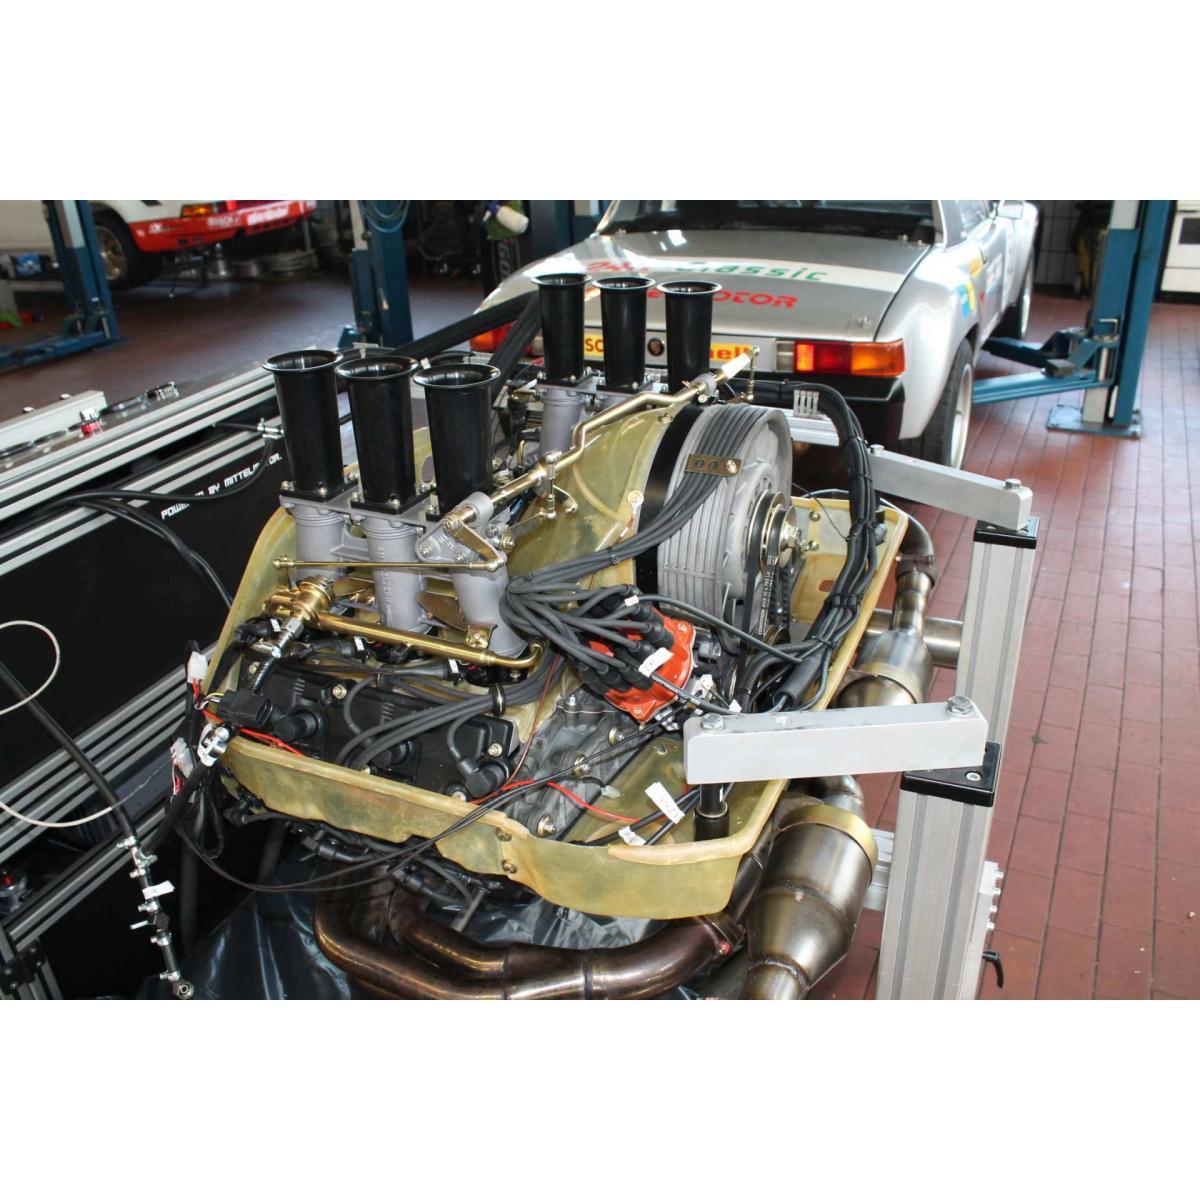 "Motor komplett, 993 4,0 RSR ""Donkey Punch"", 350 PS/ 408 Nm"